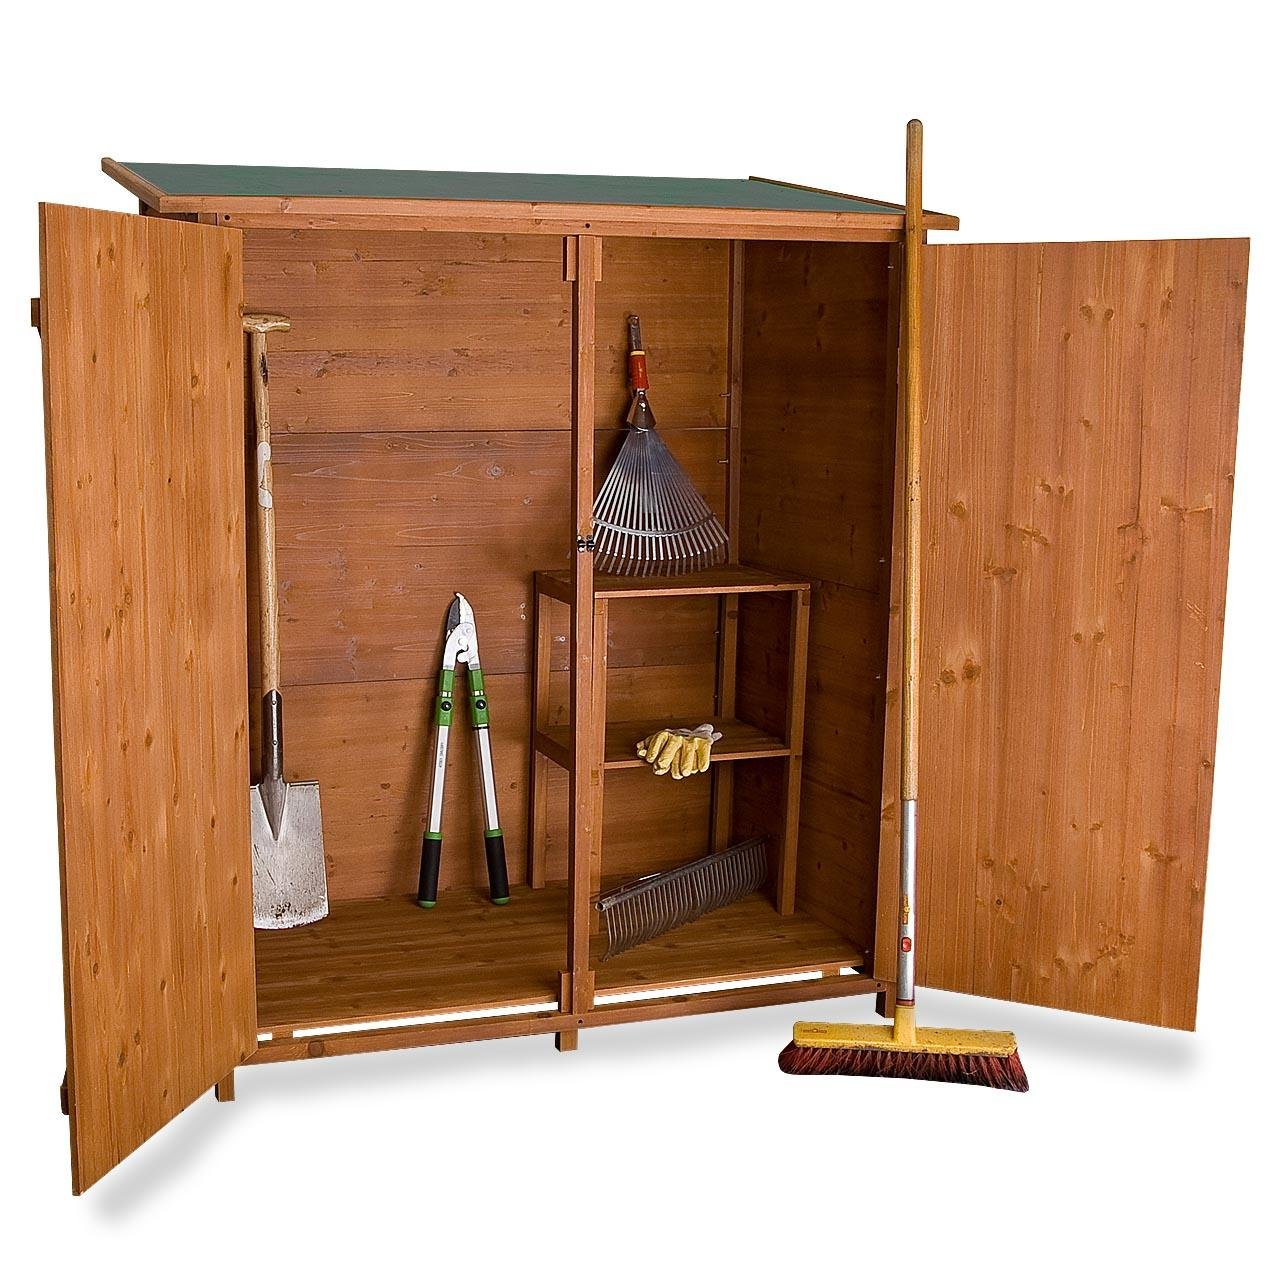 ger teschuppen aus holz sp15 hitoiro. Black Bedroom Furniture Sets. Home Design Ideas